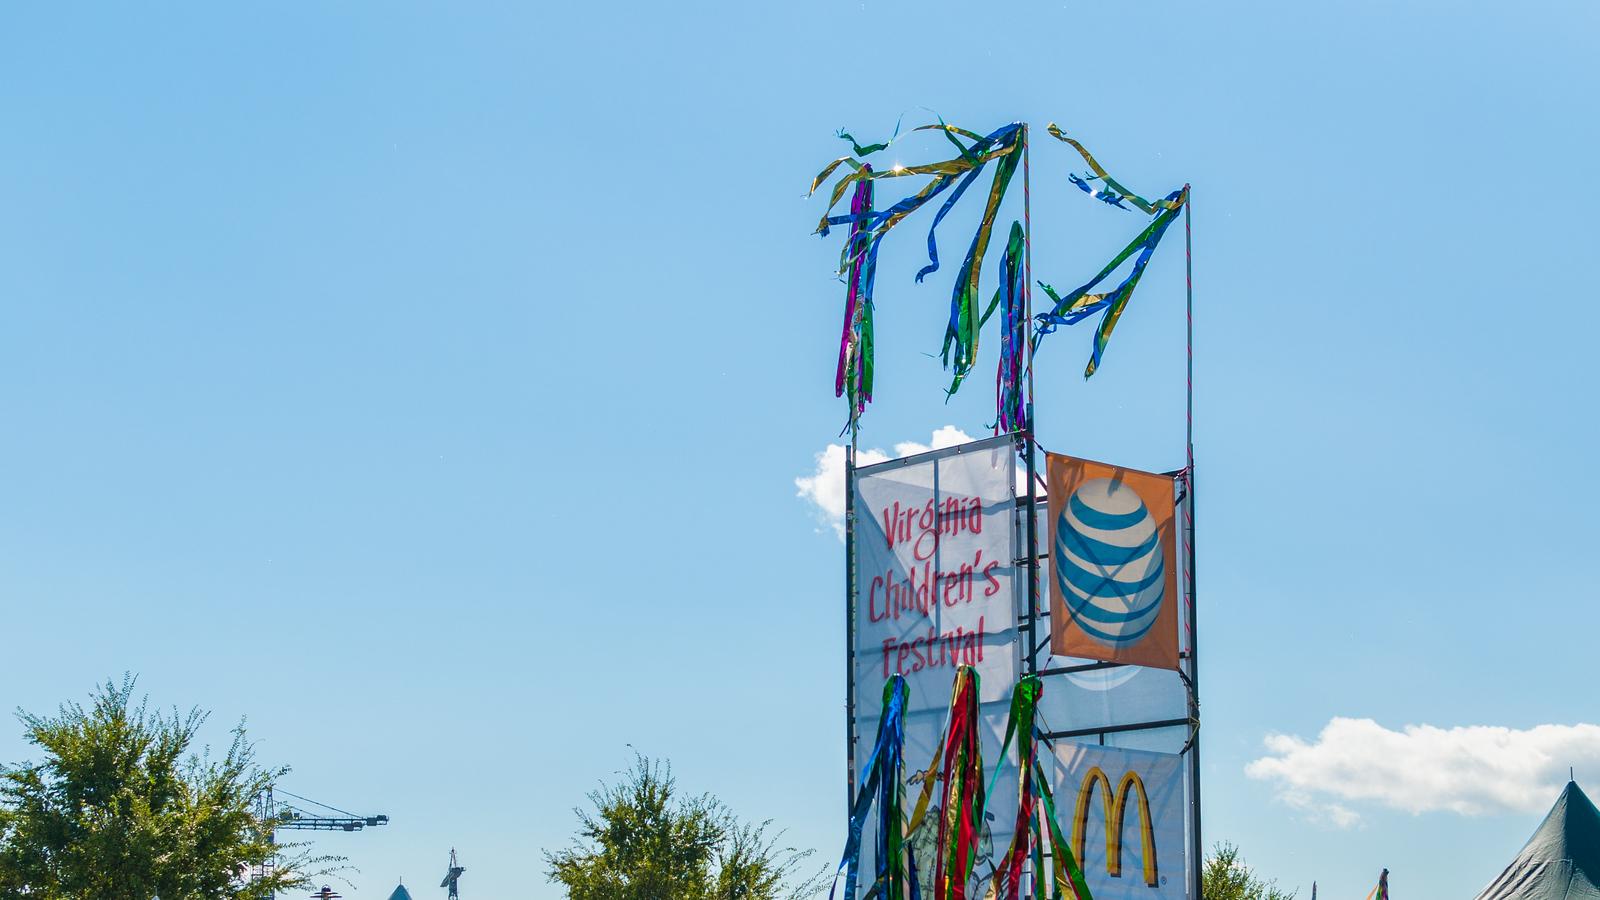 Virginia Children's Festival